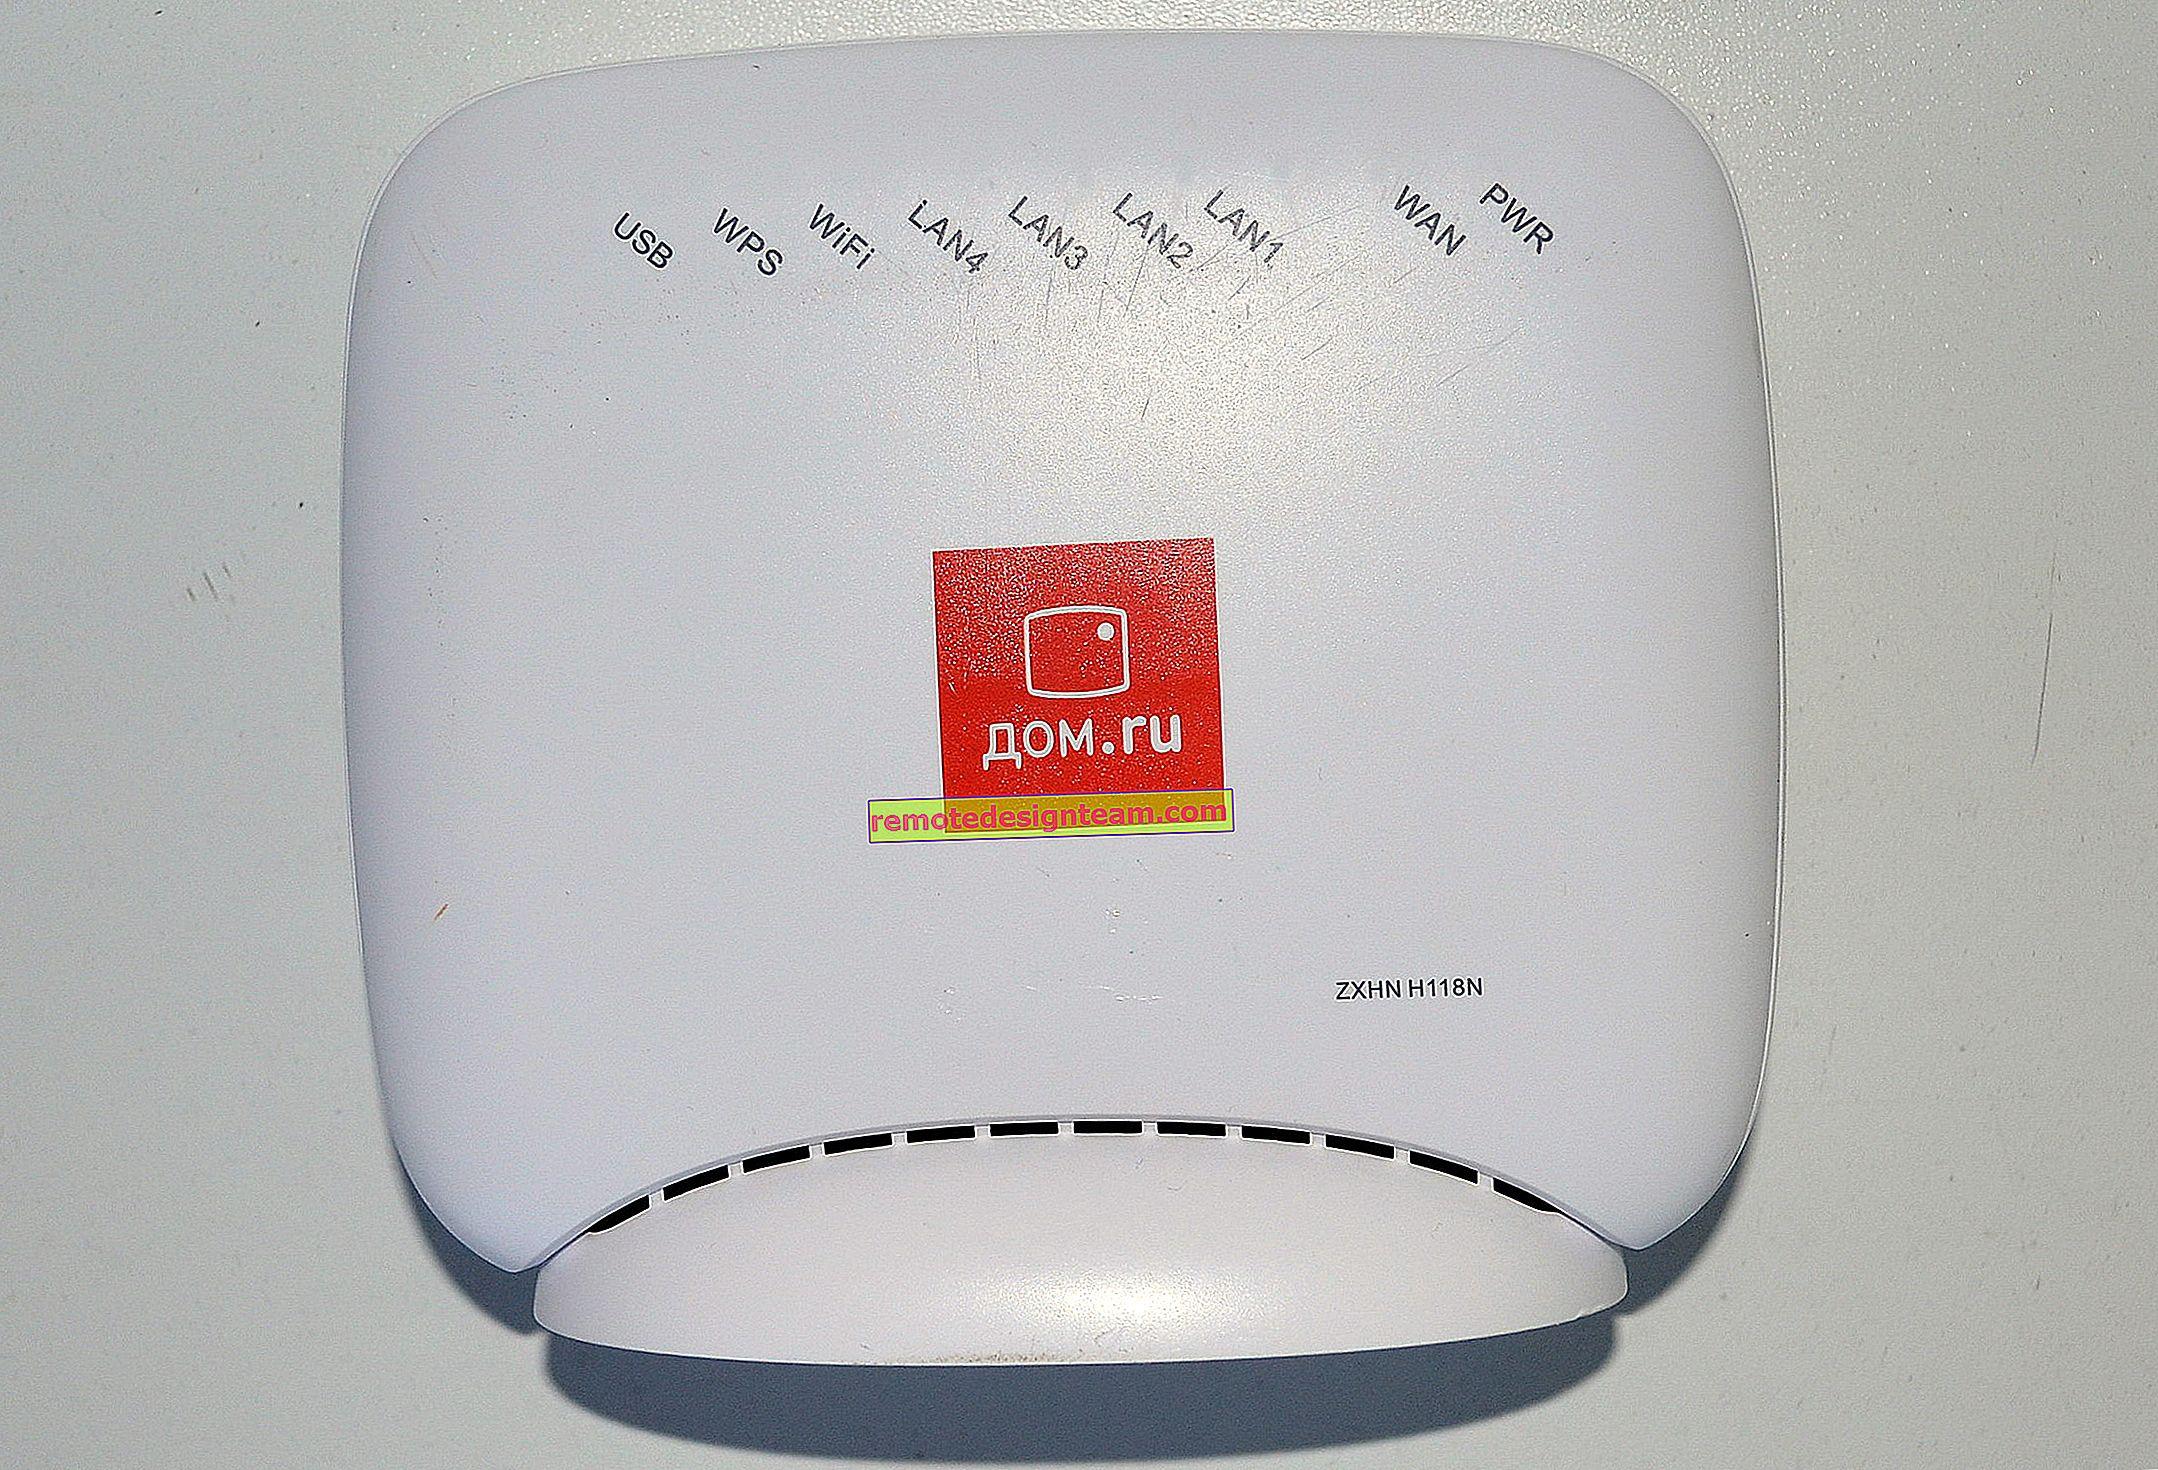 إعداد موجه Wi-Fi لموفر Dom.ru